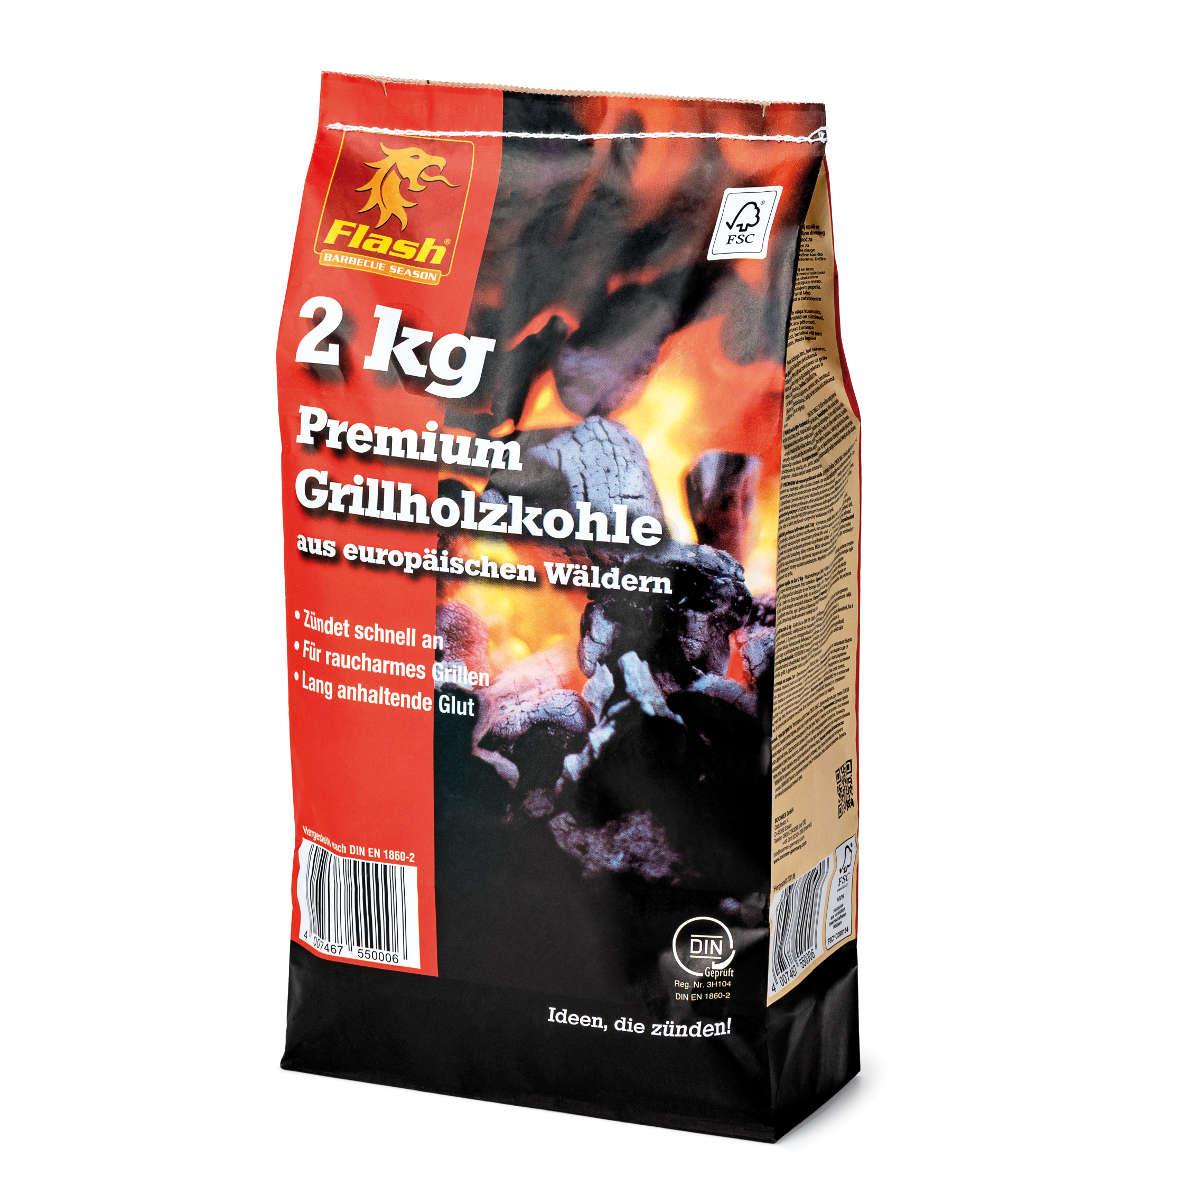 FLASH Grillholzkohle PREMIUM 2 kg FSC